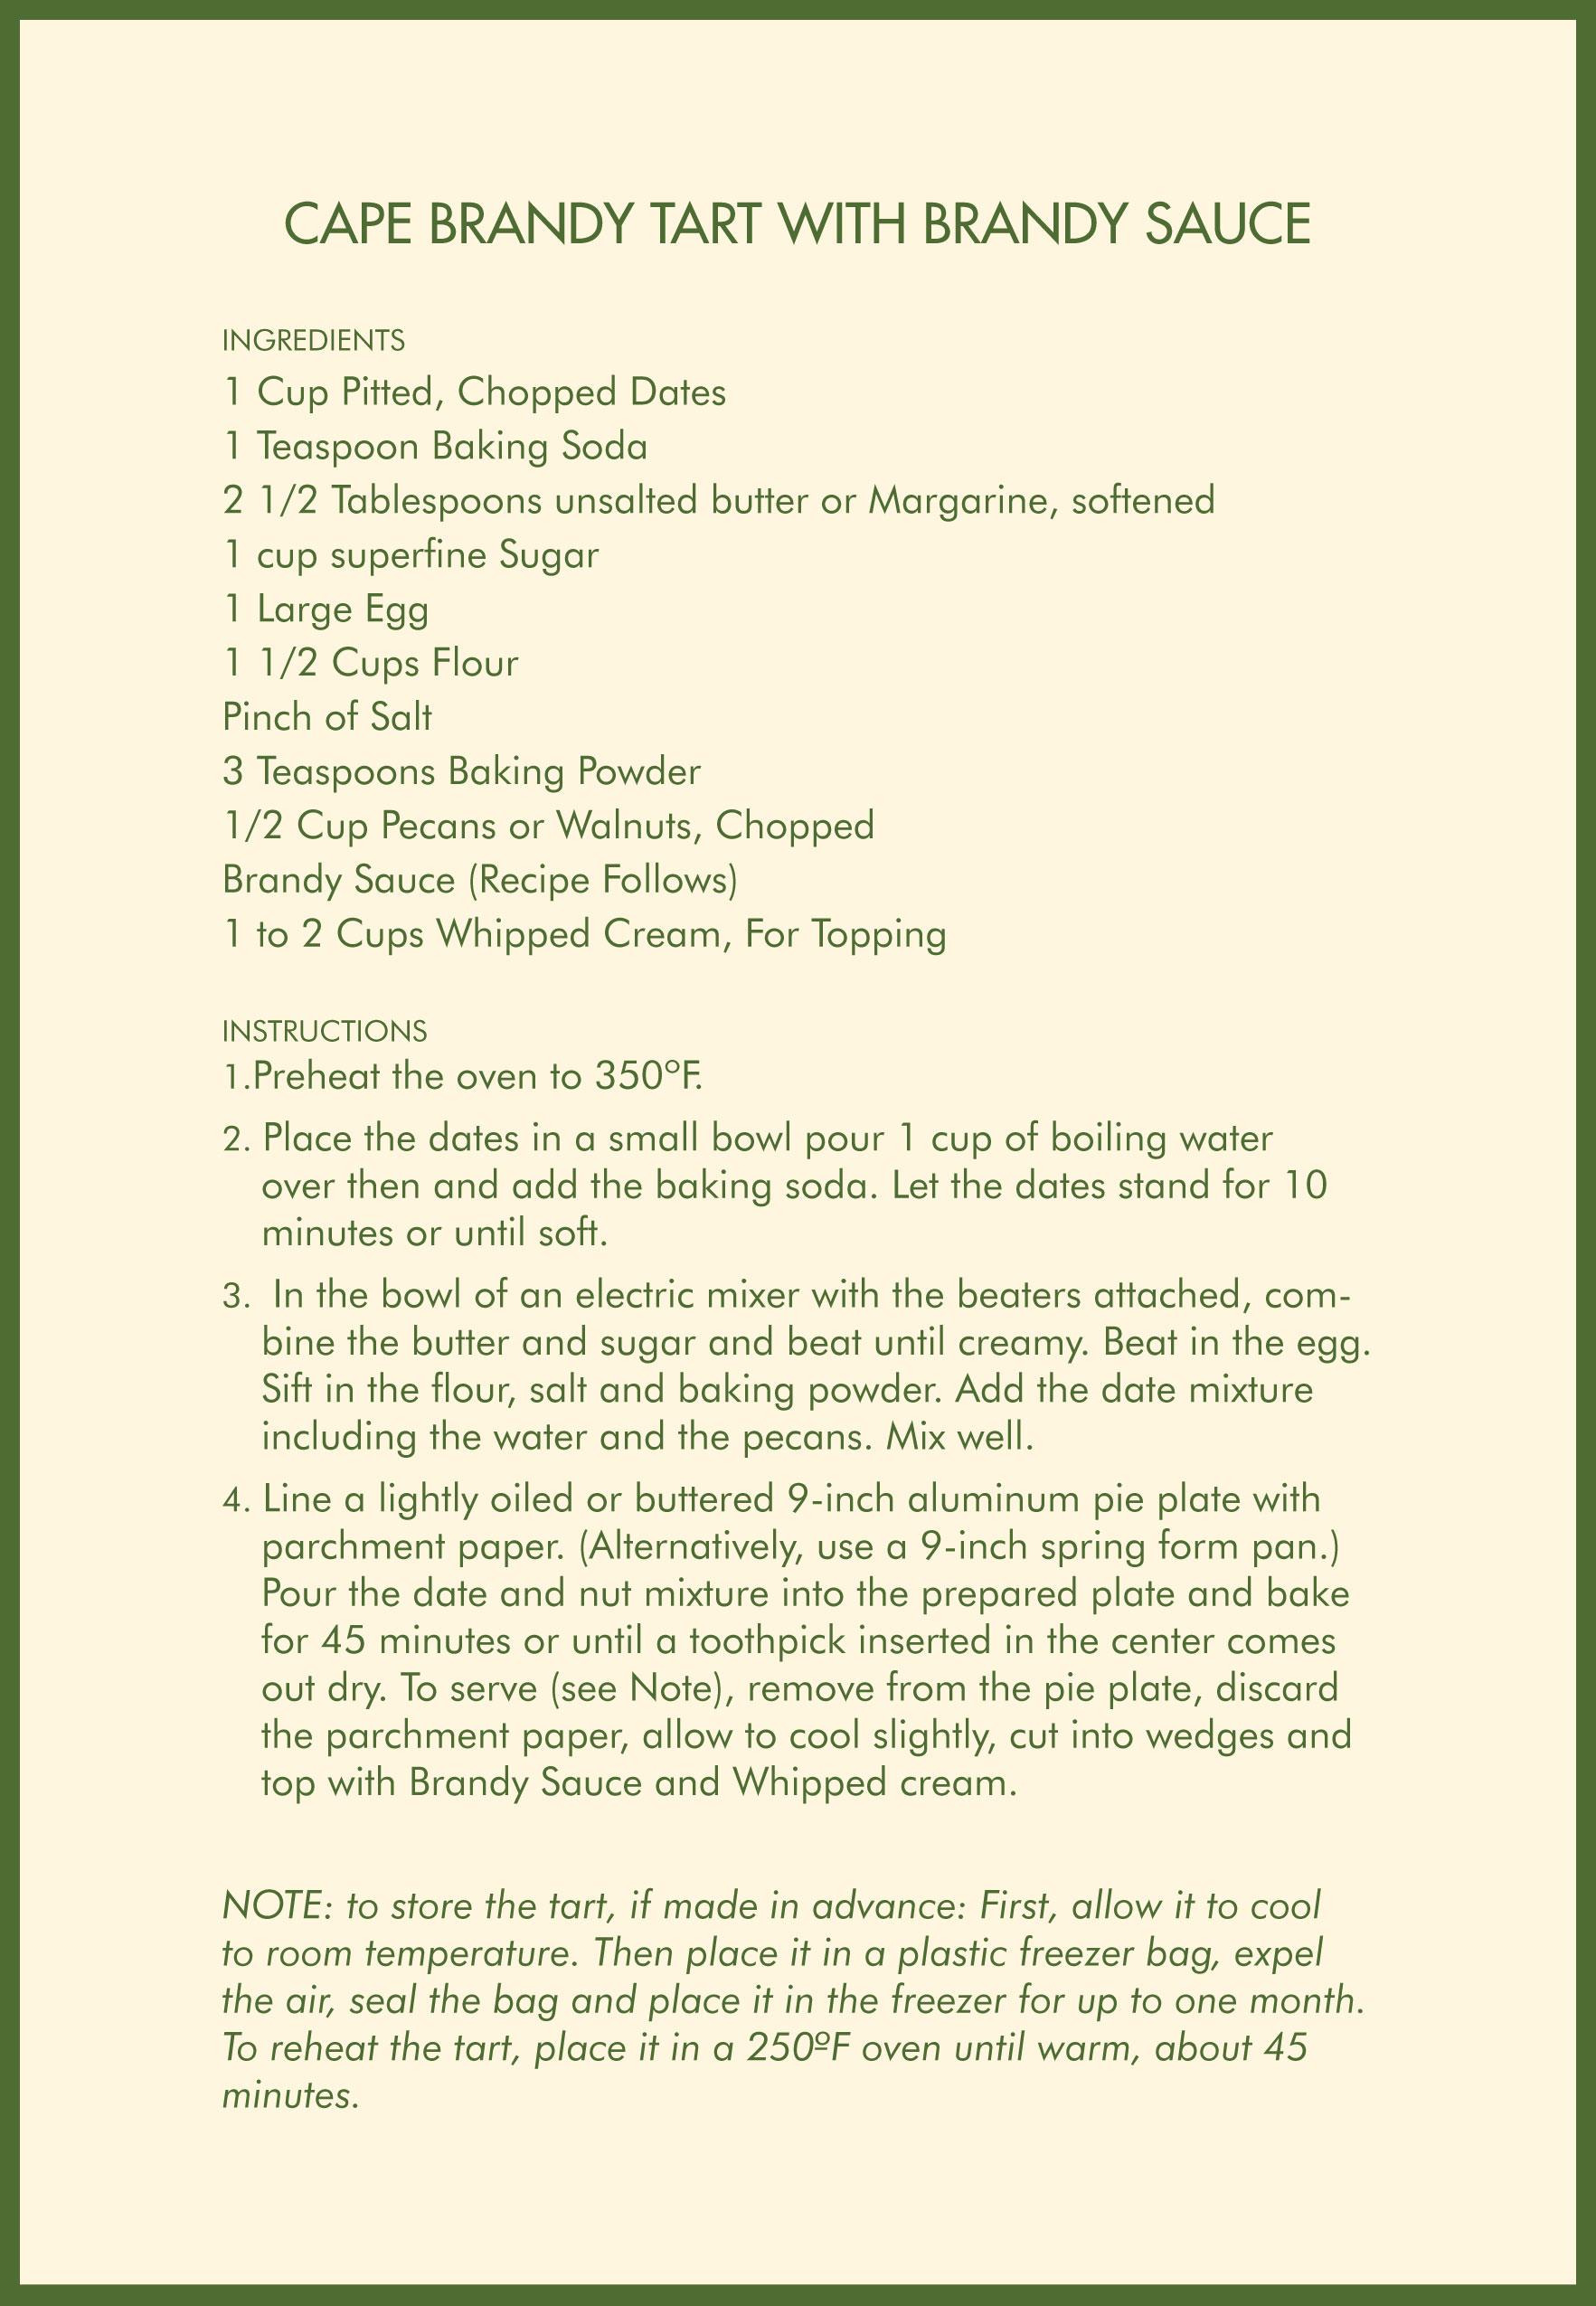 Cafe Brandy Tart With Brandy Sauce